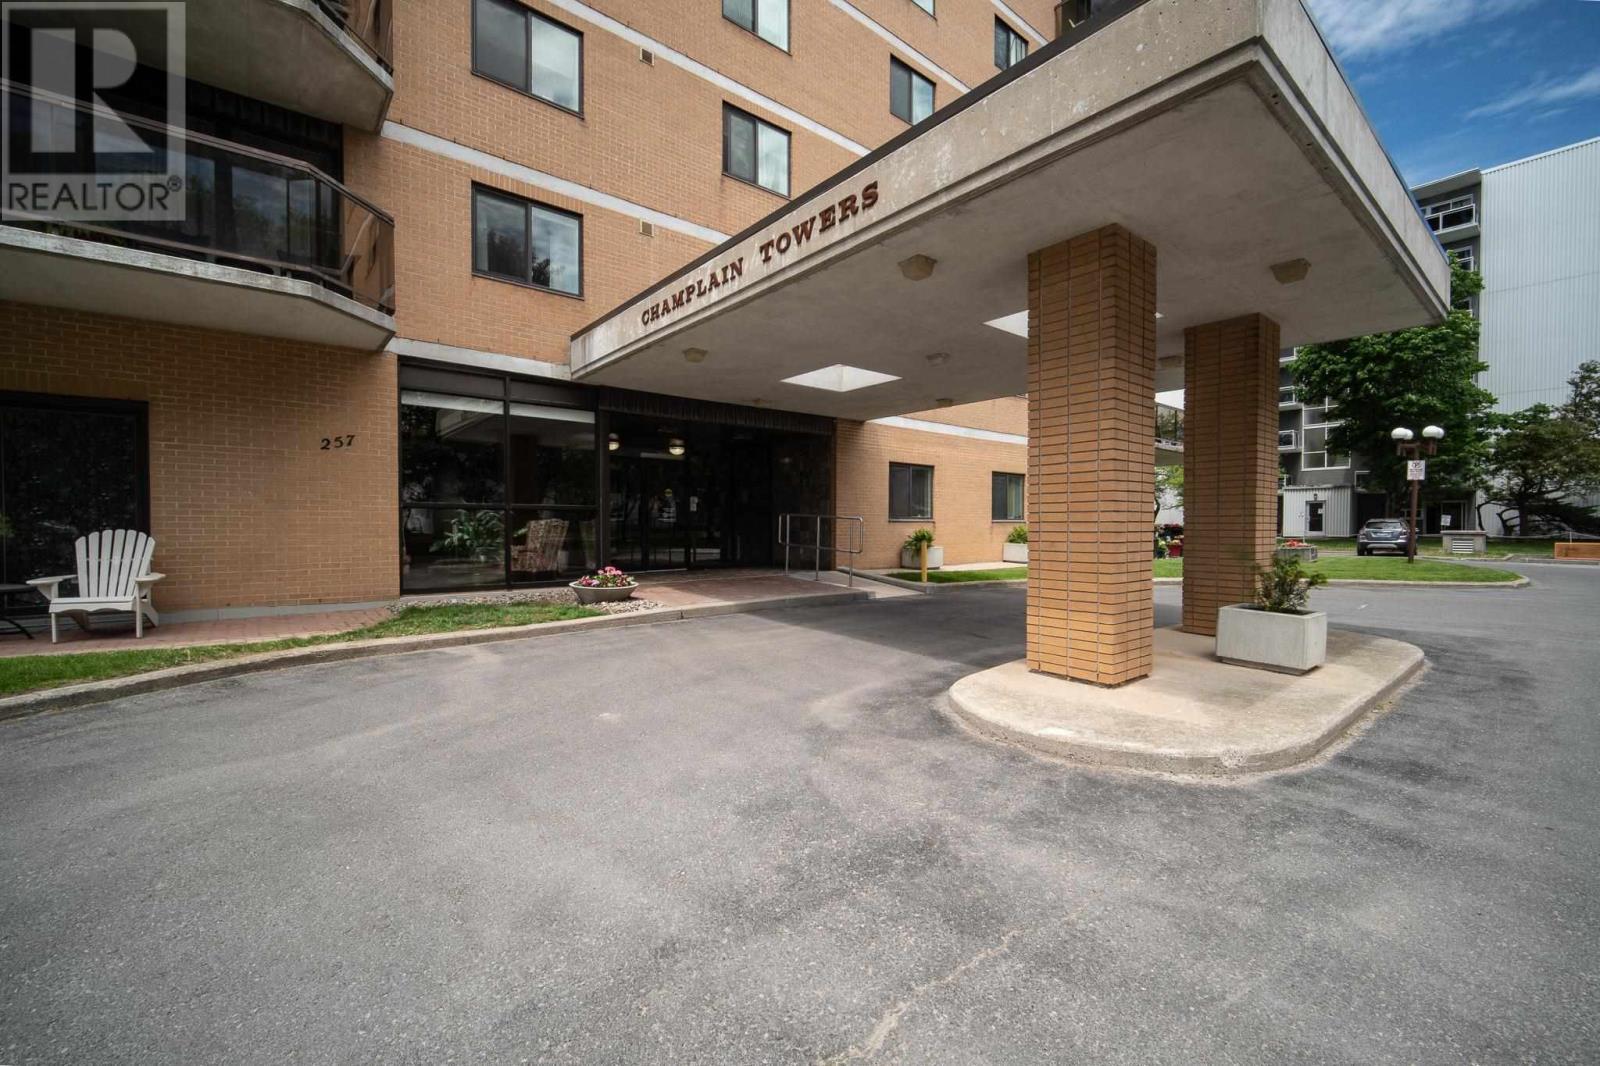 Property Listing: 257 Bath Rd #705, Kingston, Ontario